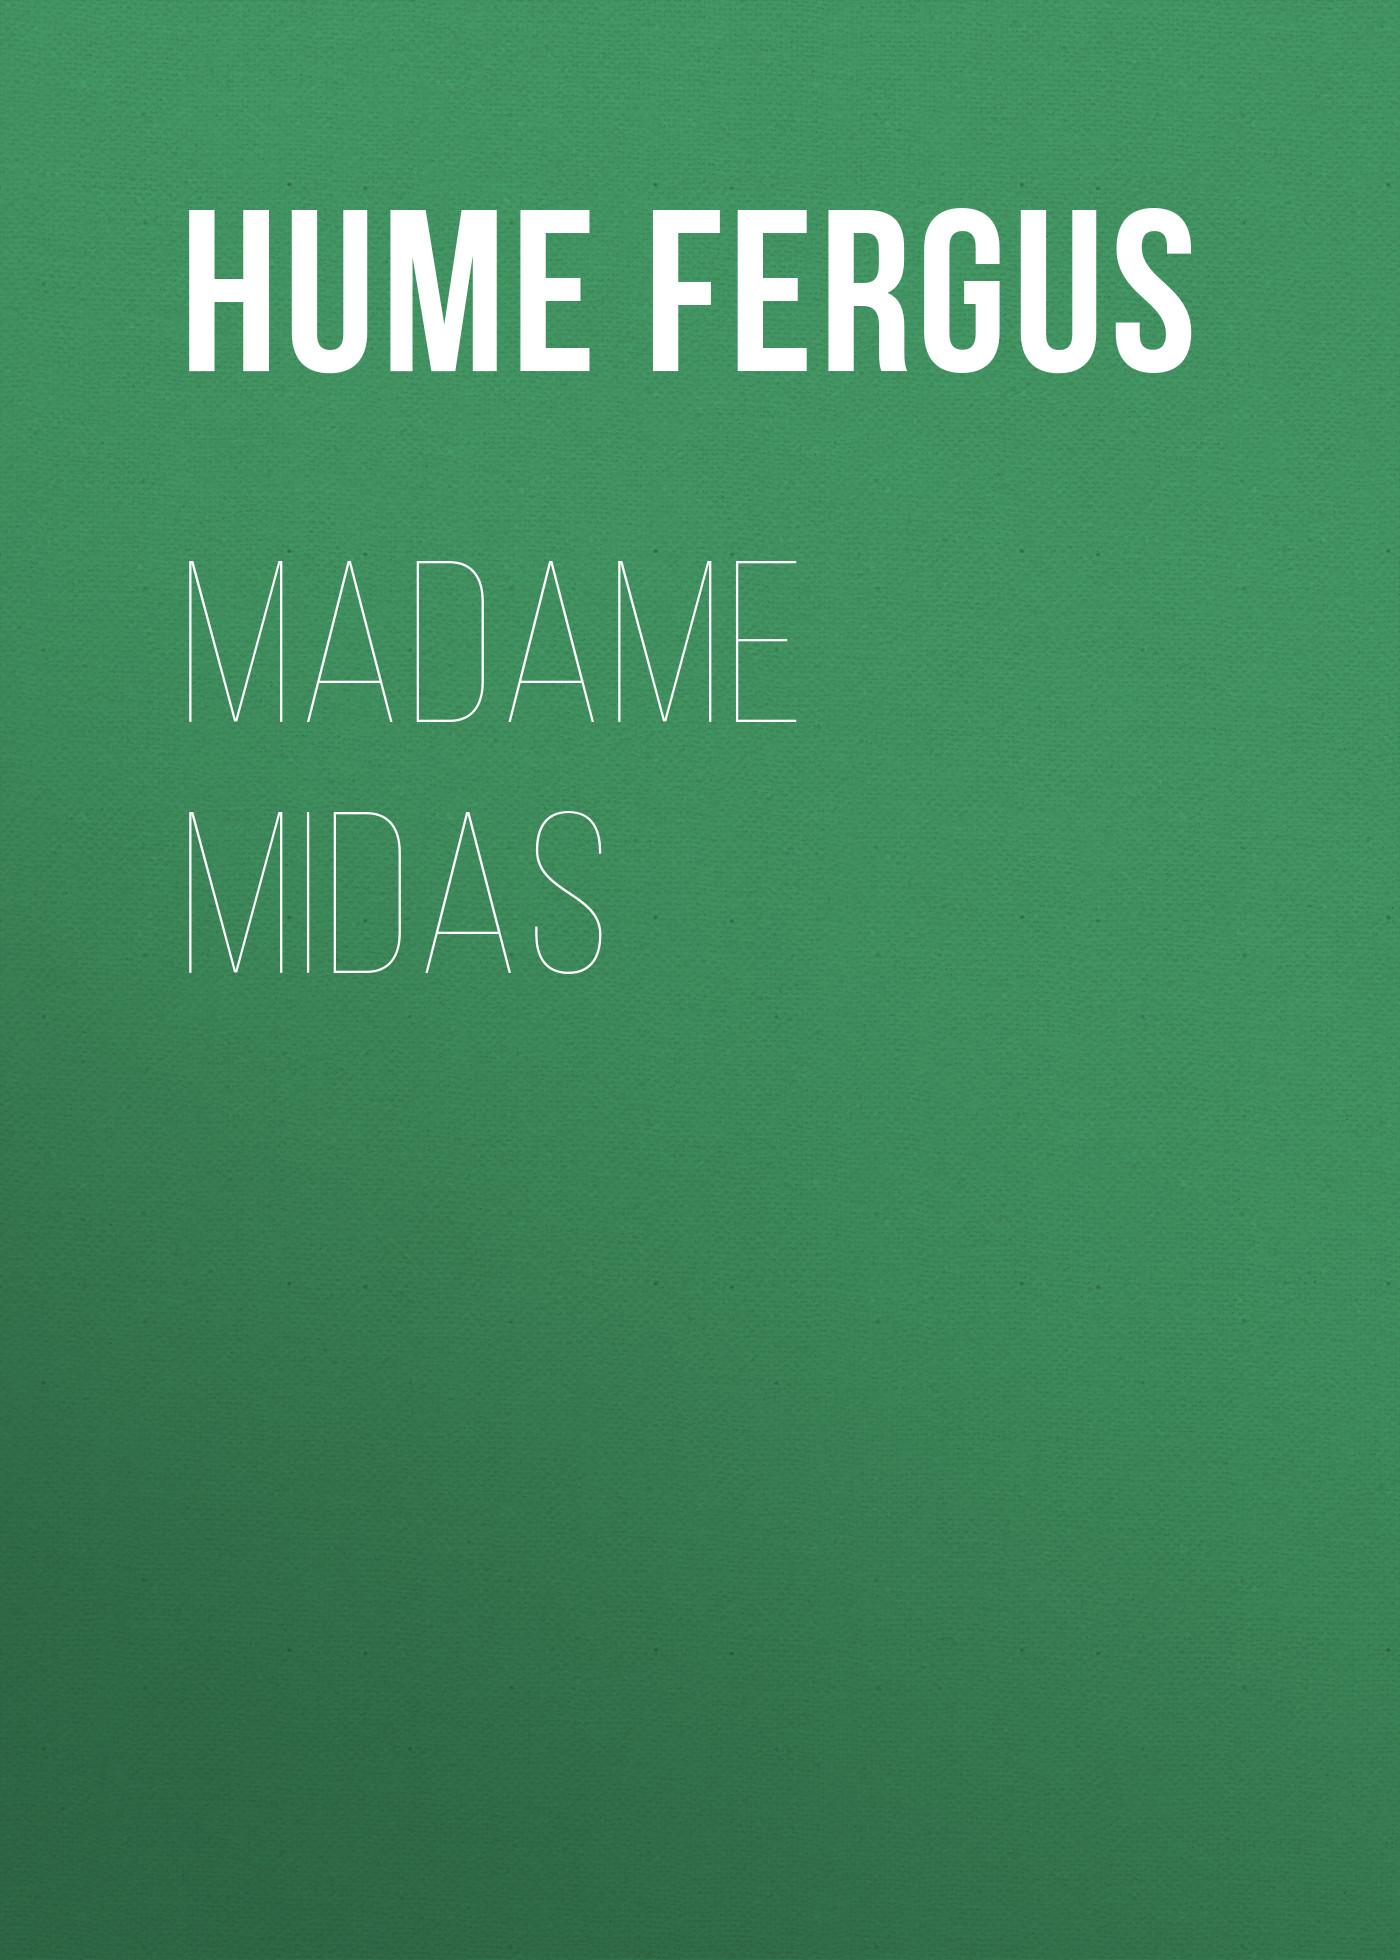 все цены на Hume Fergus Madame Midas